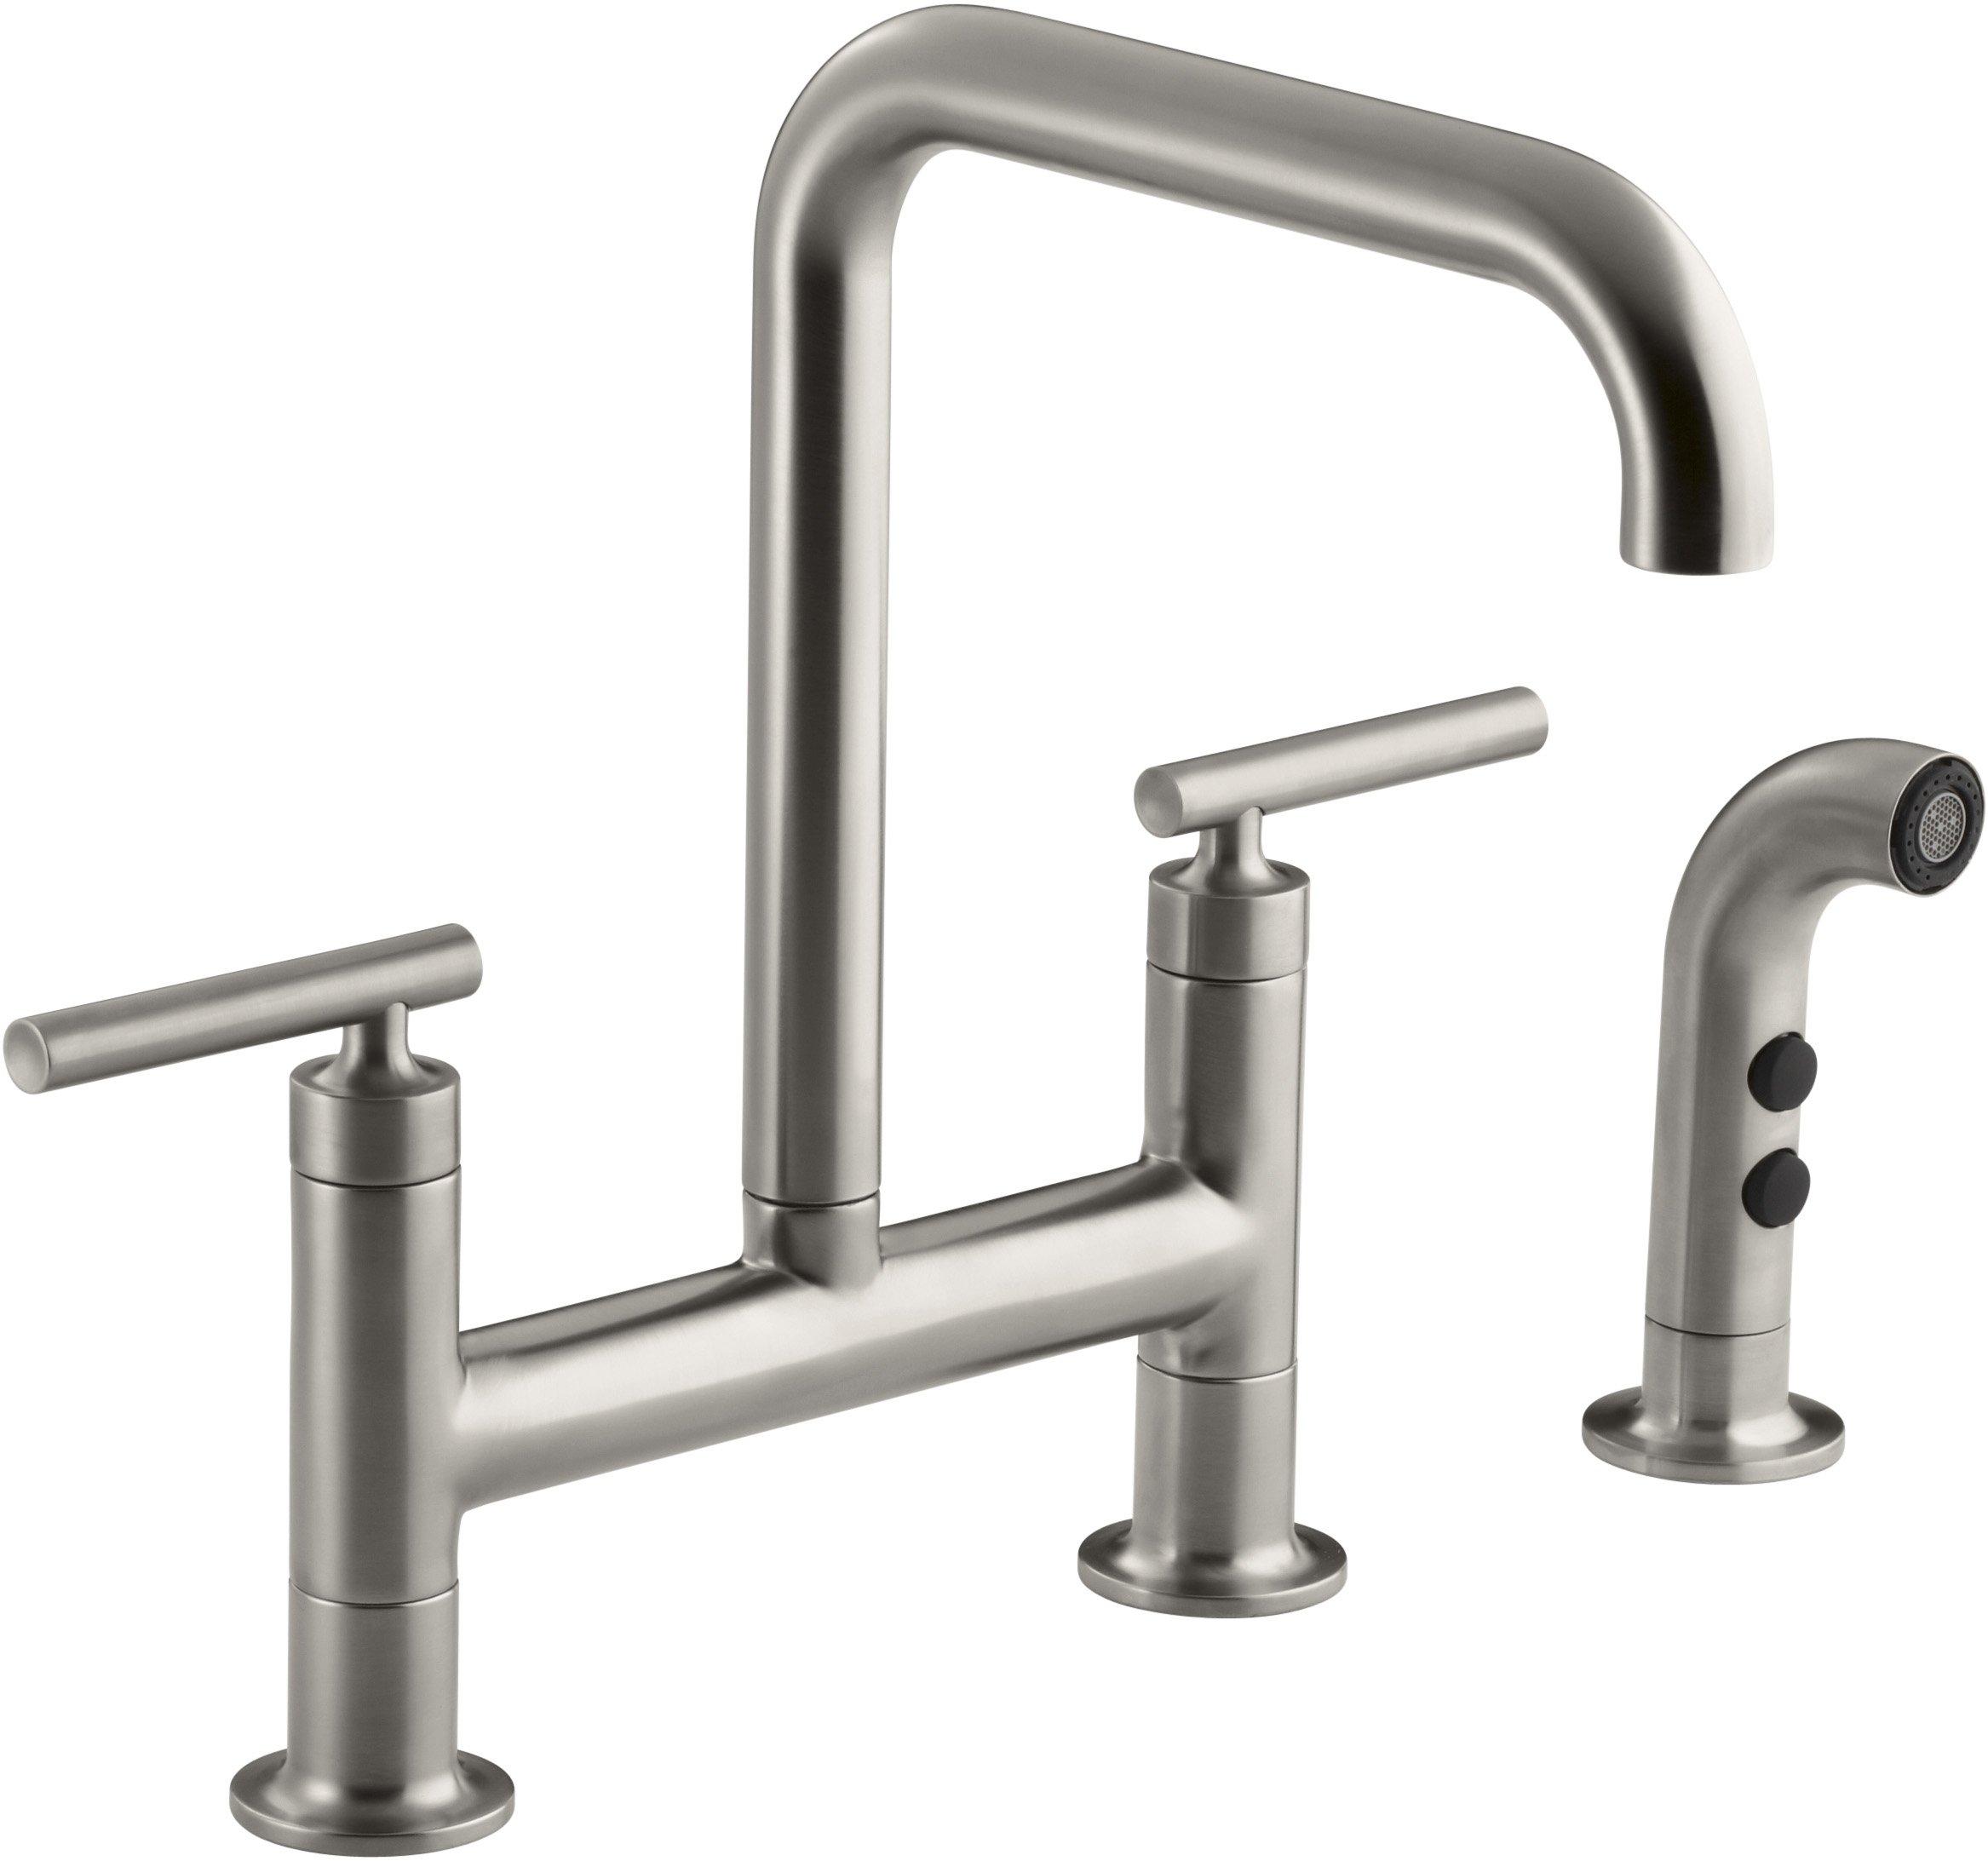 KOHLER K-7548-4-VS Purist Deck-Mount Bridge Faucet with Sidespray, Vibrant Stainless